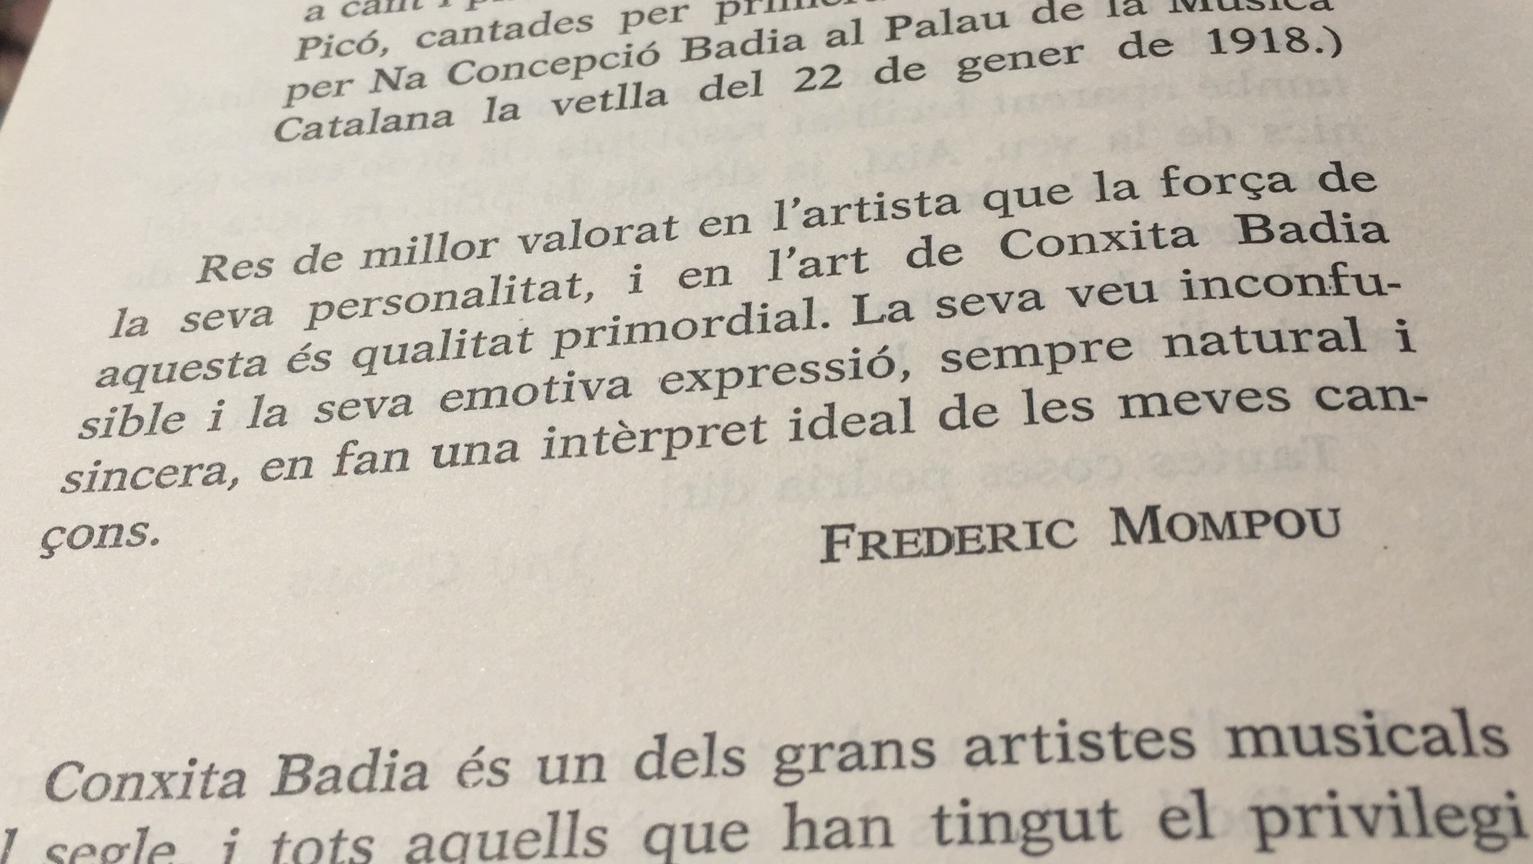 Conxita Badia, per Frederic Mompou